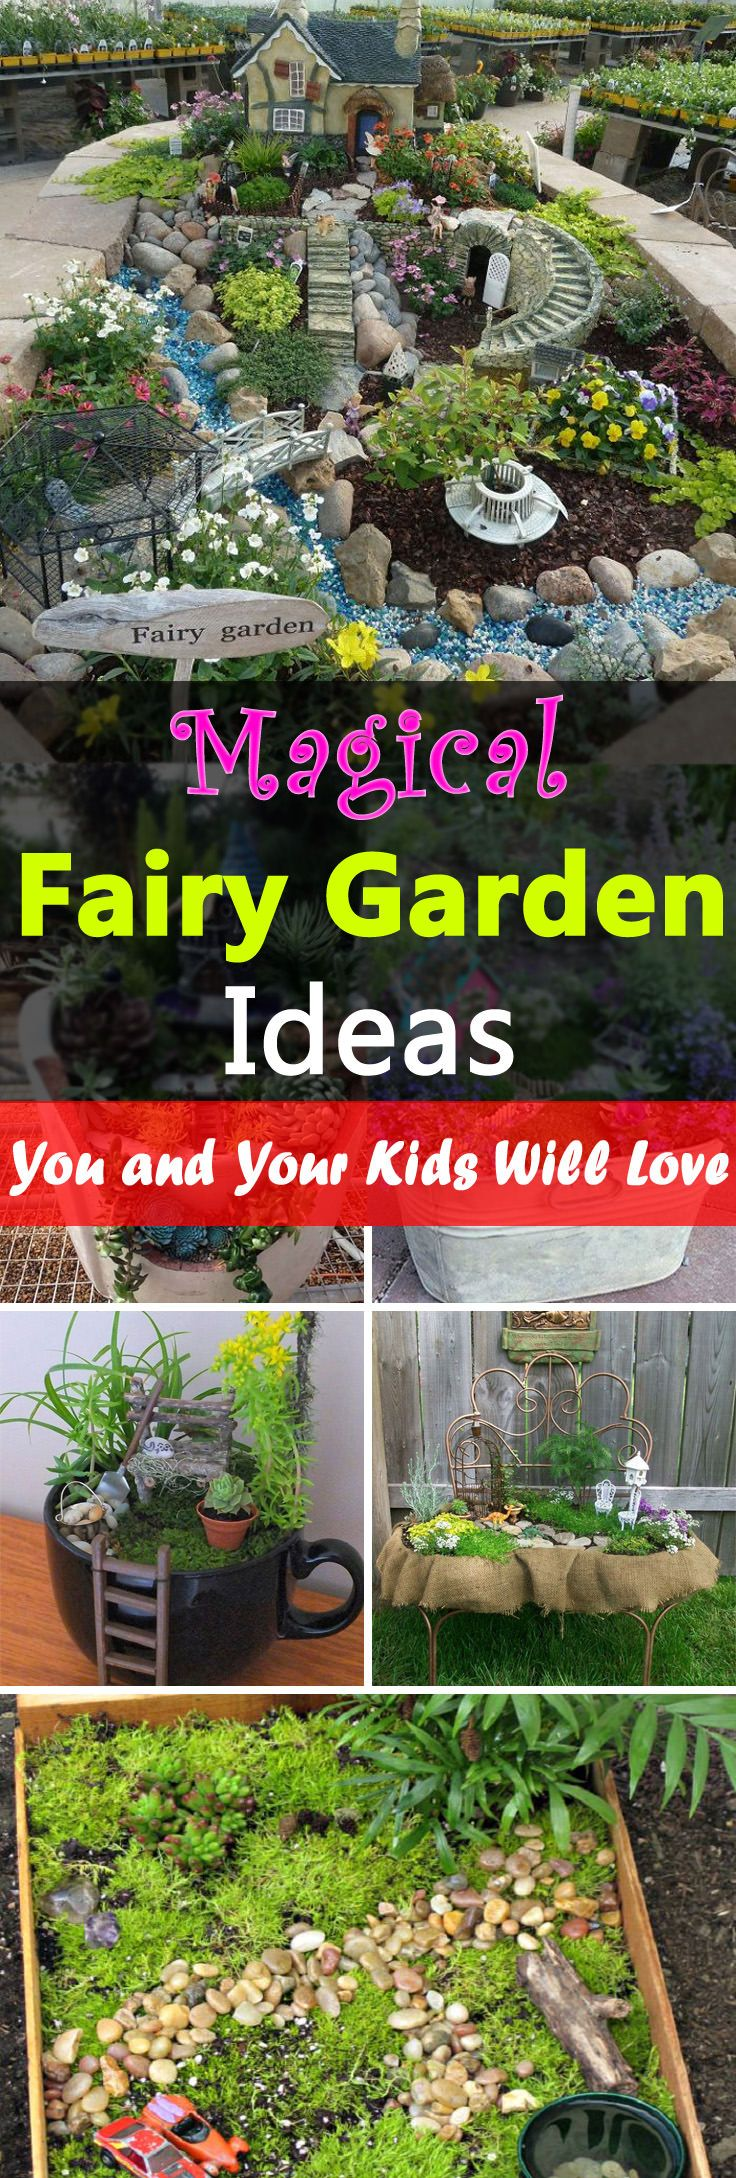 Garden Art Ideas For Kids best 20+ recycled garden crafts ideas on pinterest | recycled